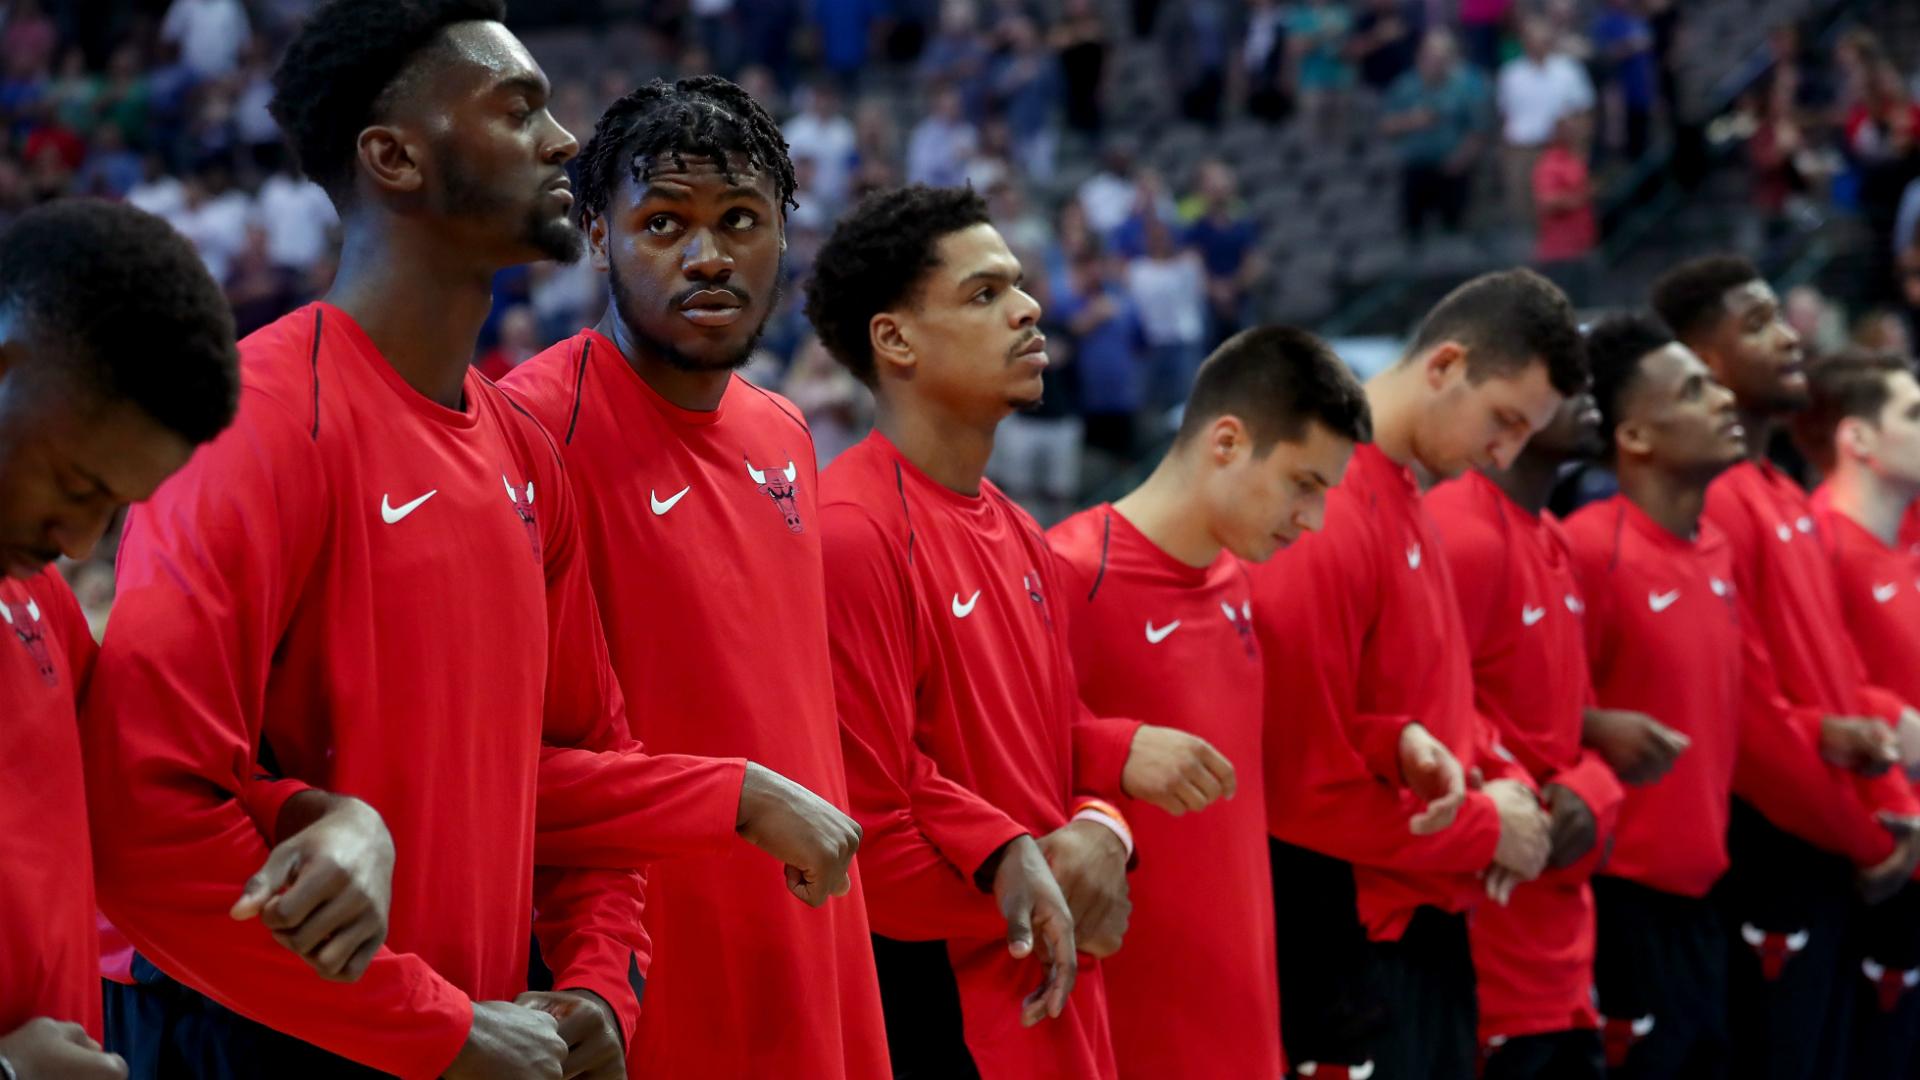 Bulls need continuity to restore NBA glory days, Luc Longley says